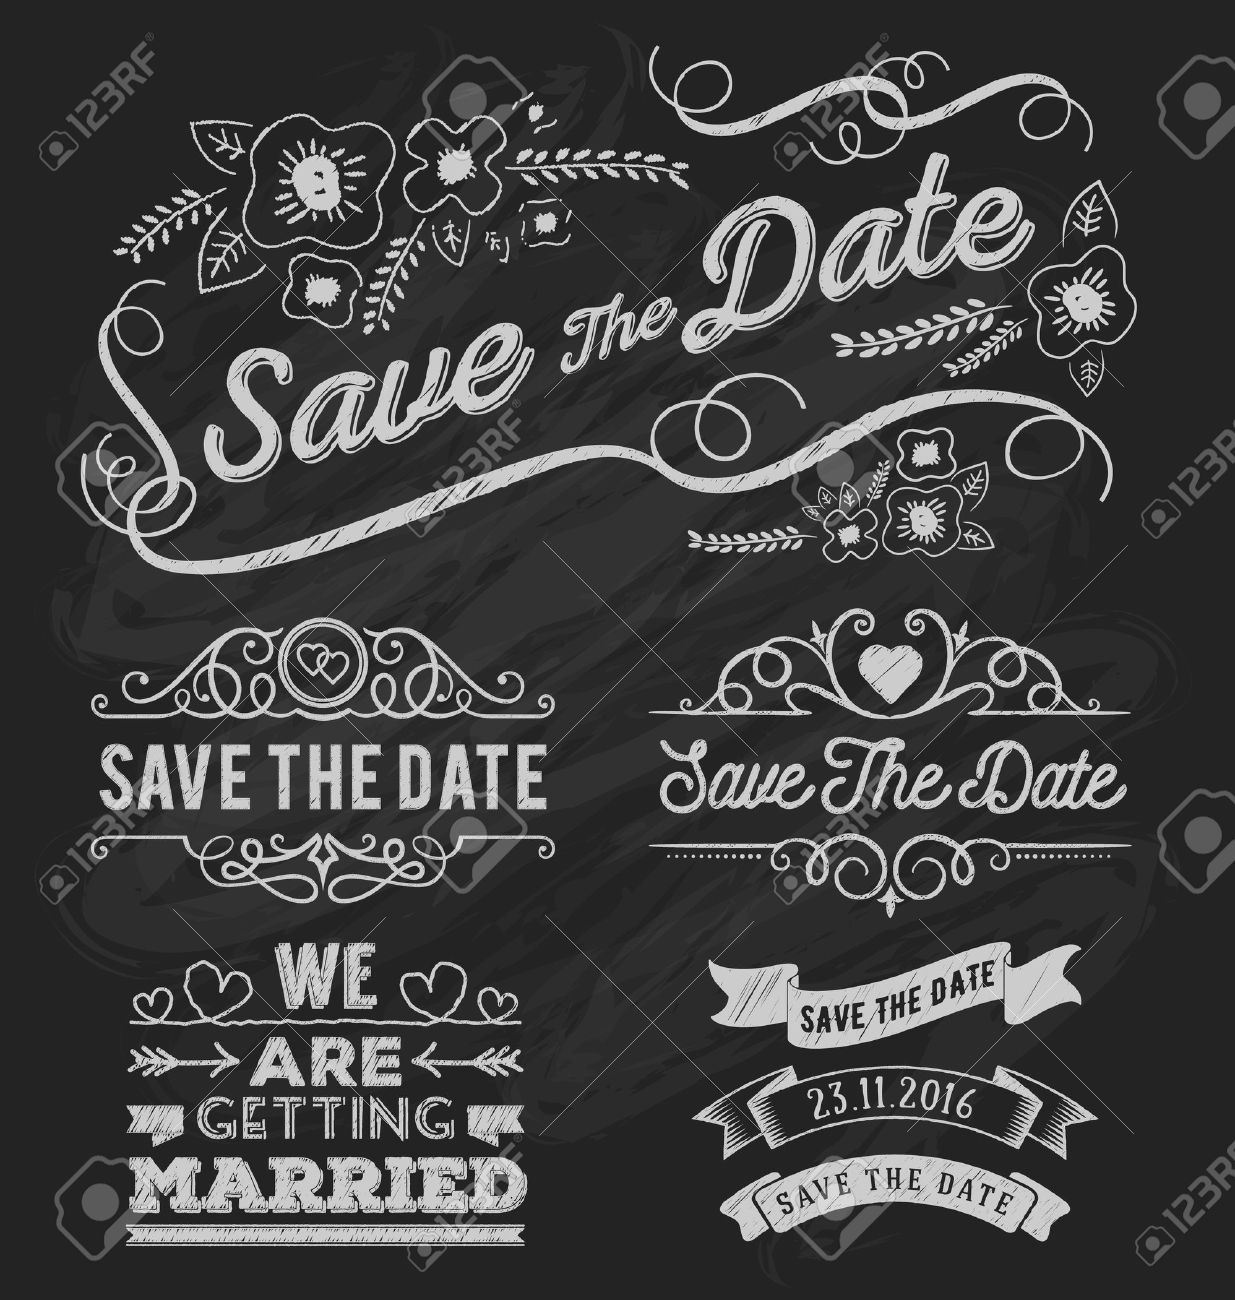 Set of save the date typography, frame and ribbon chalk style. Save the date frame and element on chalkboard design. Vector illustration - 45707860